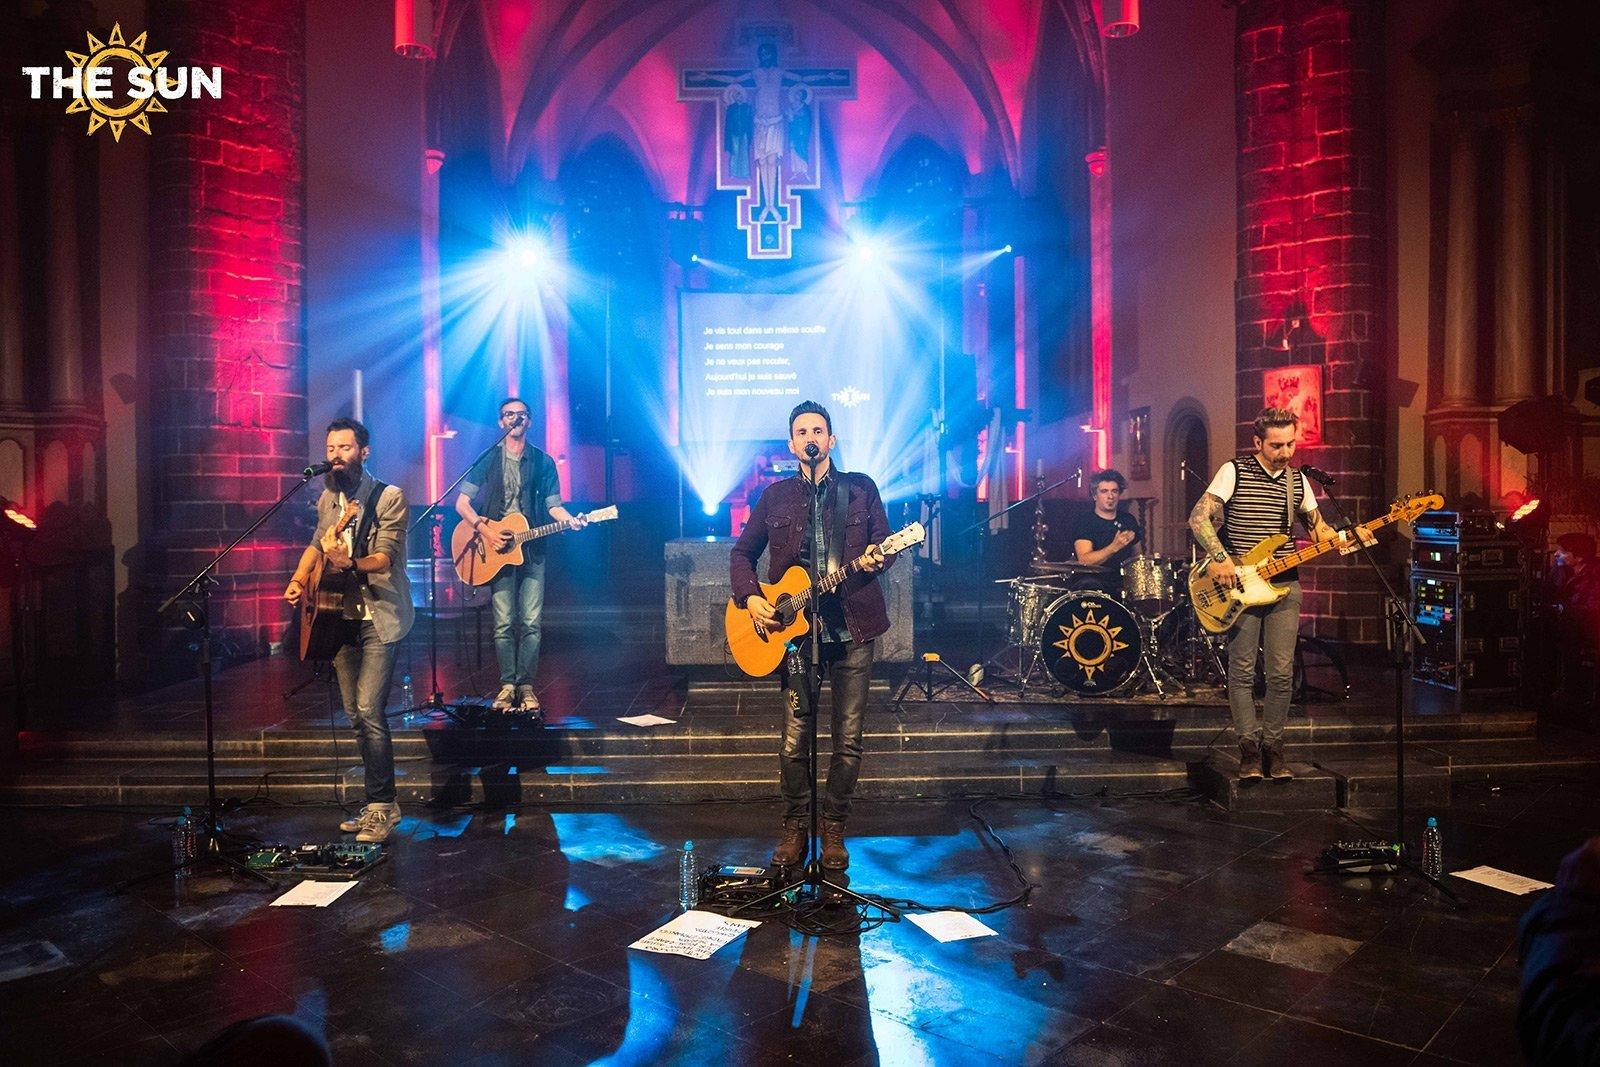 the sun rock band live wavre belgio